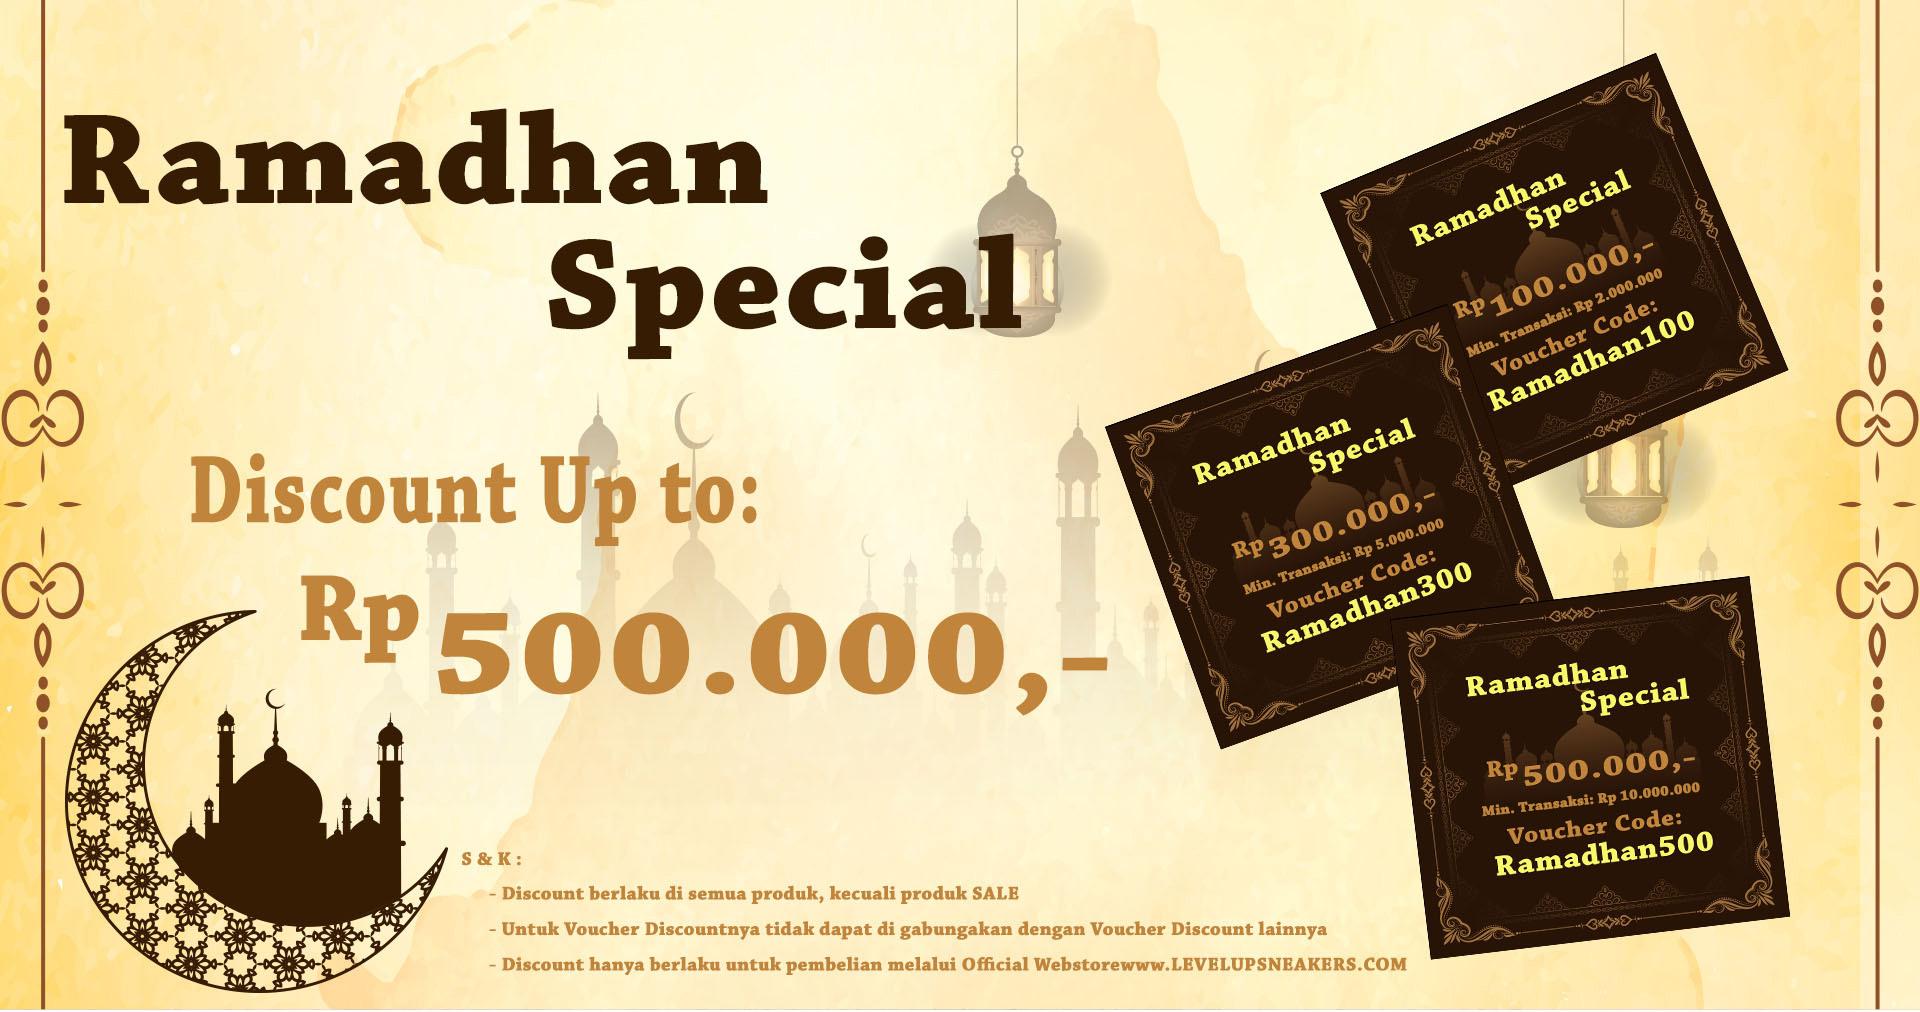 Ramadhan Special 2021